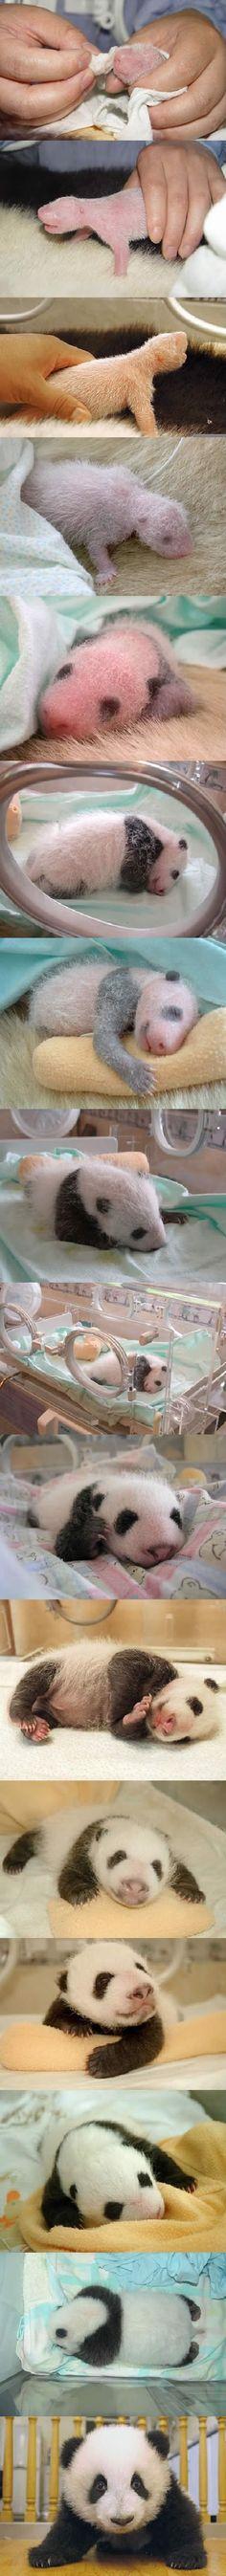 Who doesn't like Pandas?